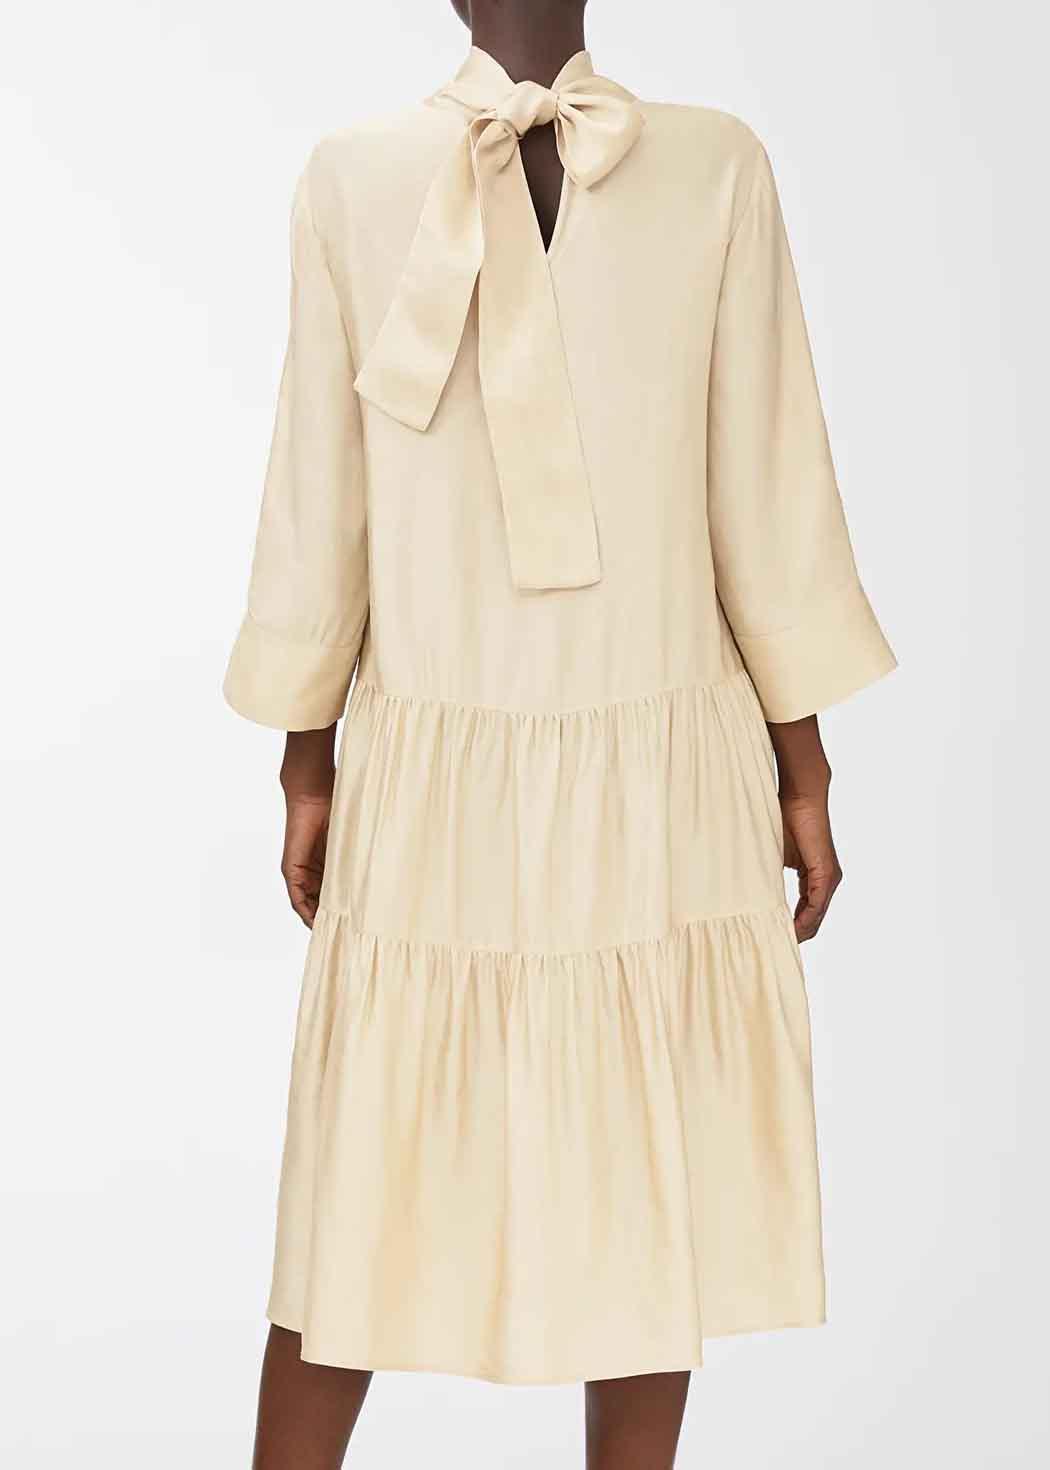 arket bow dress